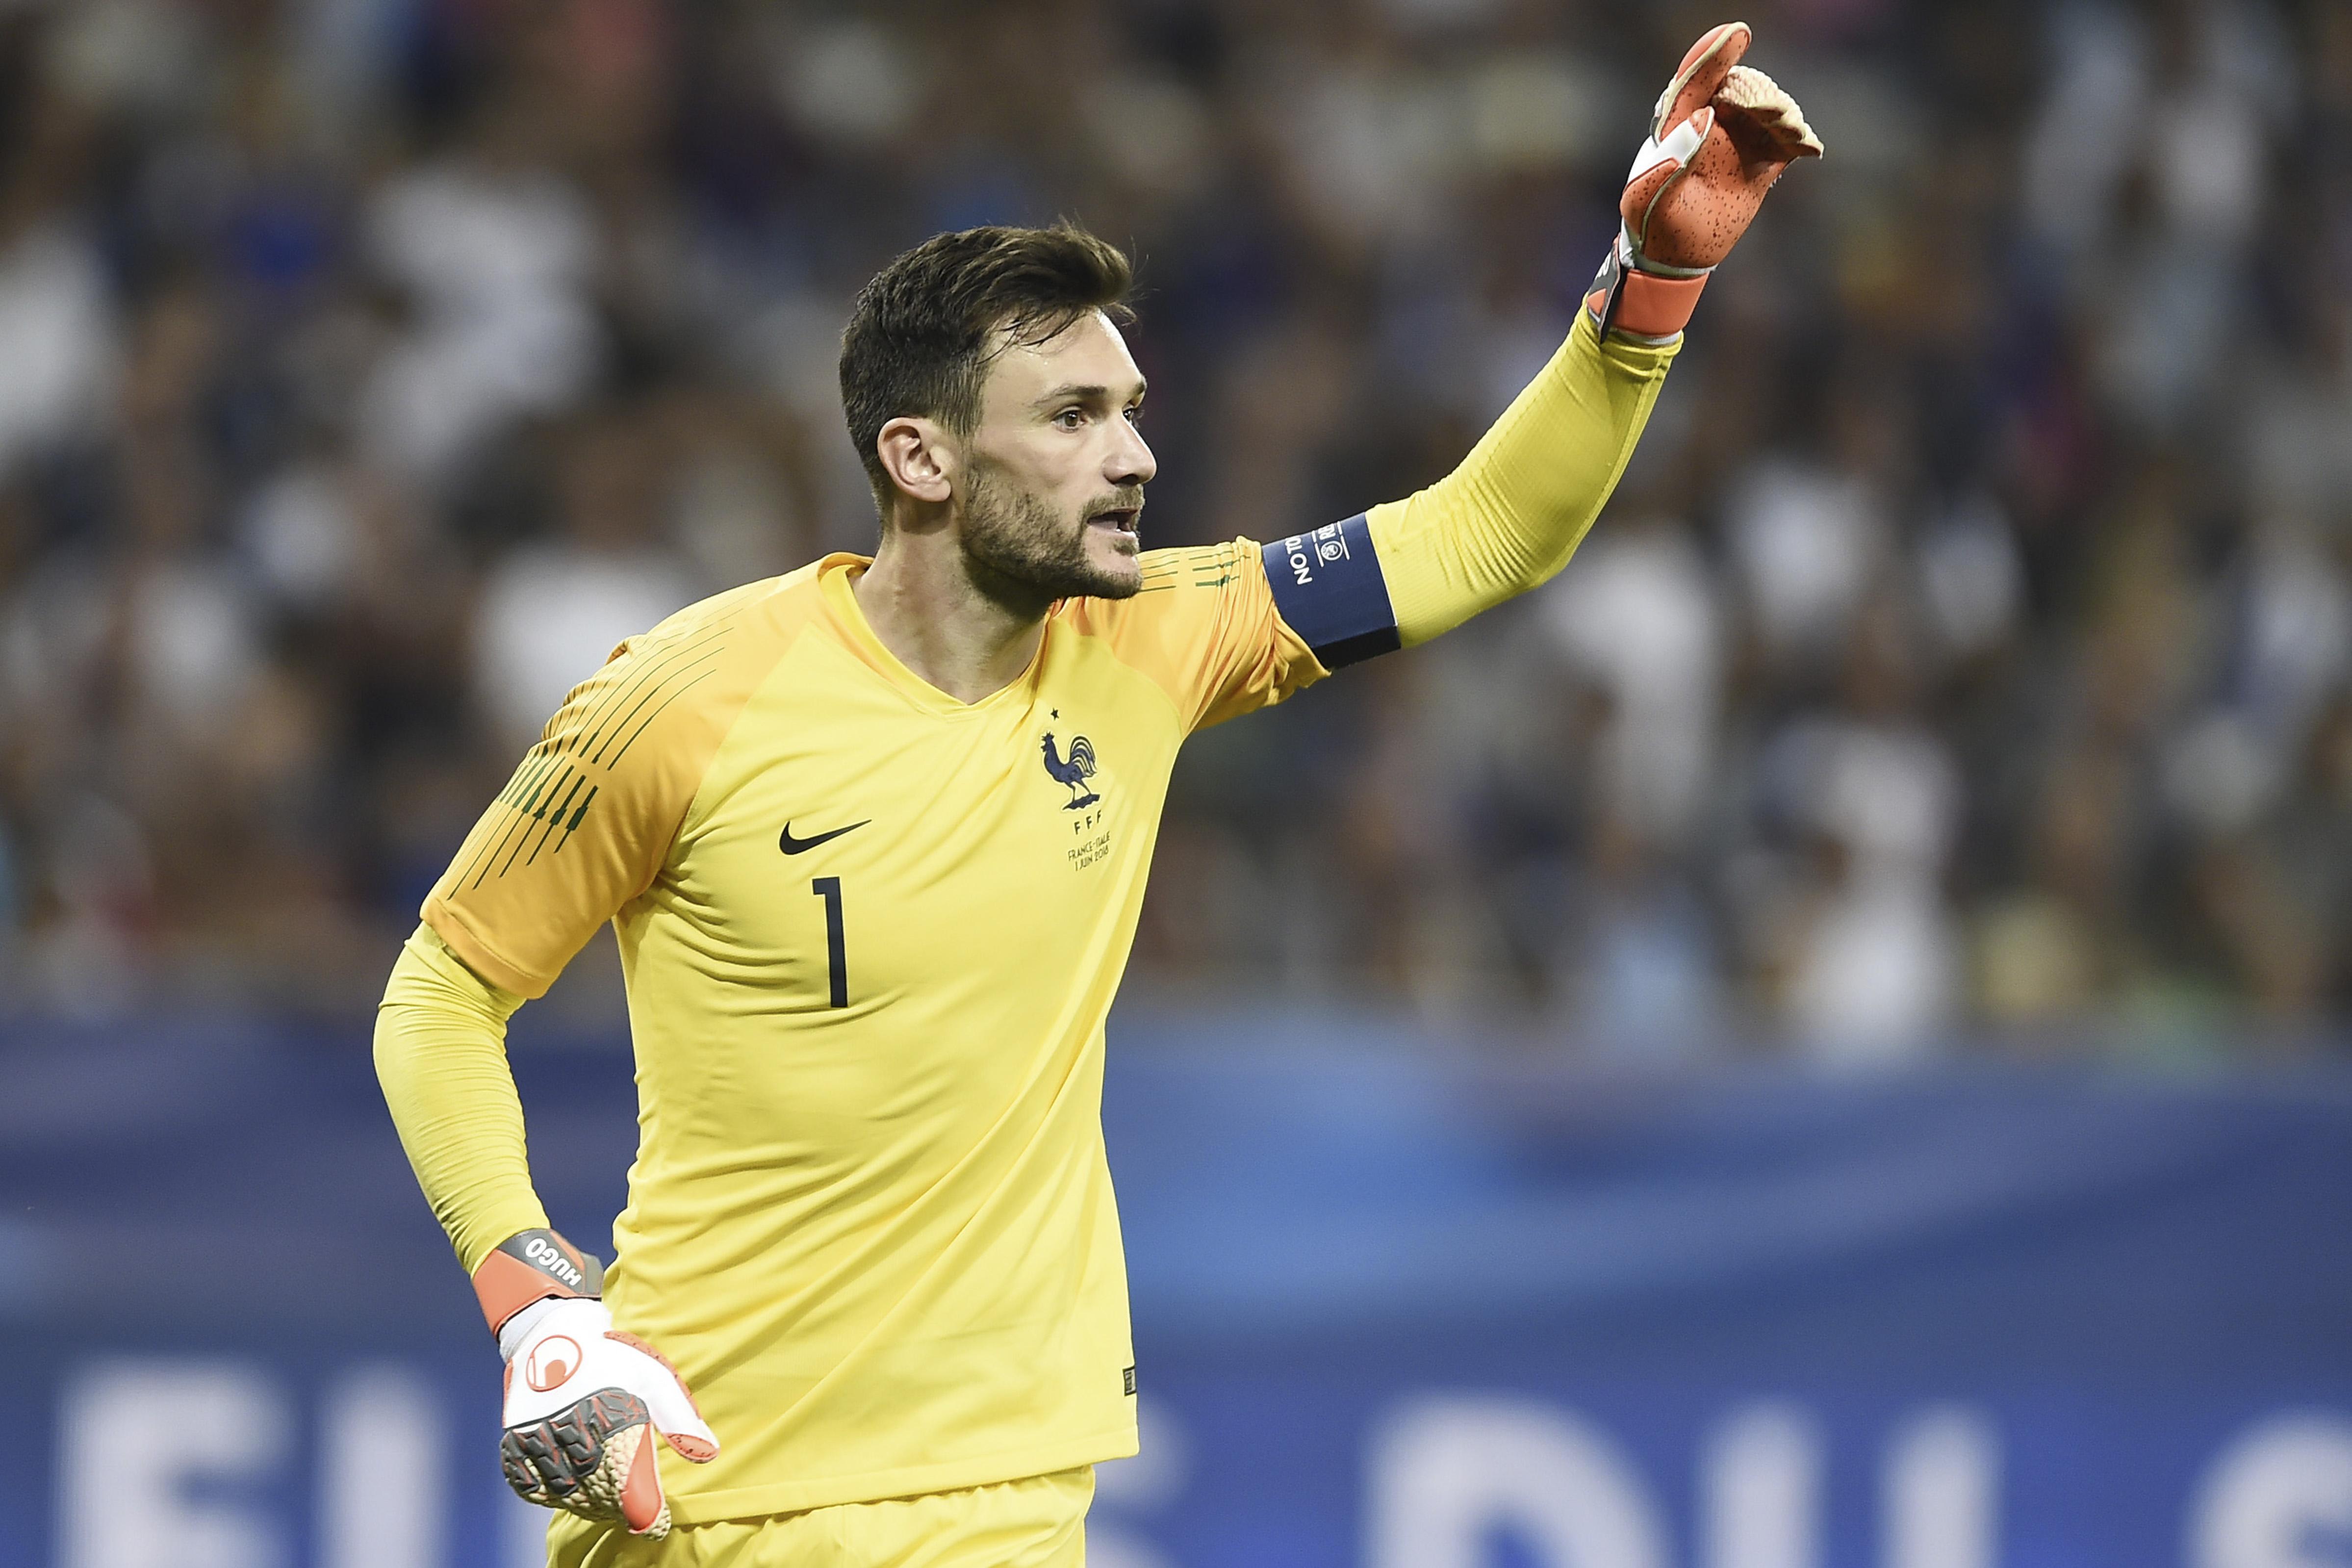 France team captain Hugo Lloris